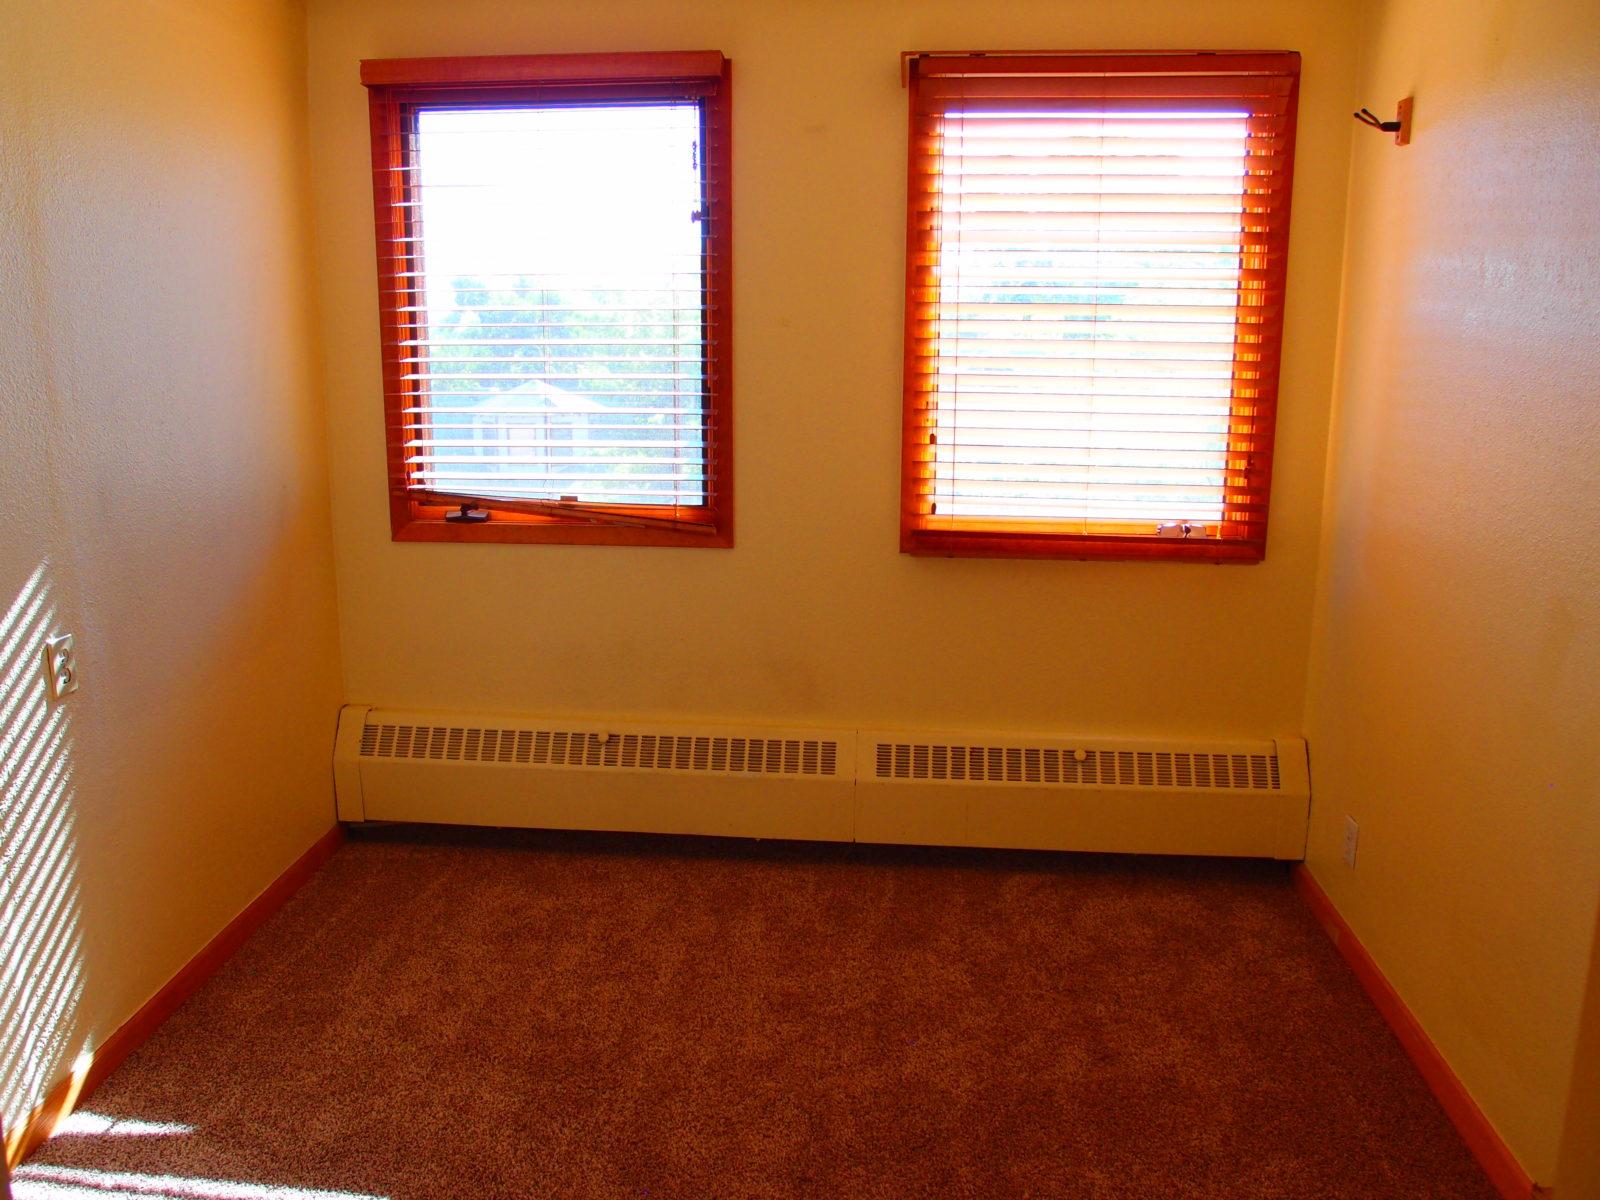 909 smaller room